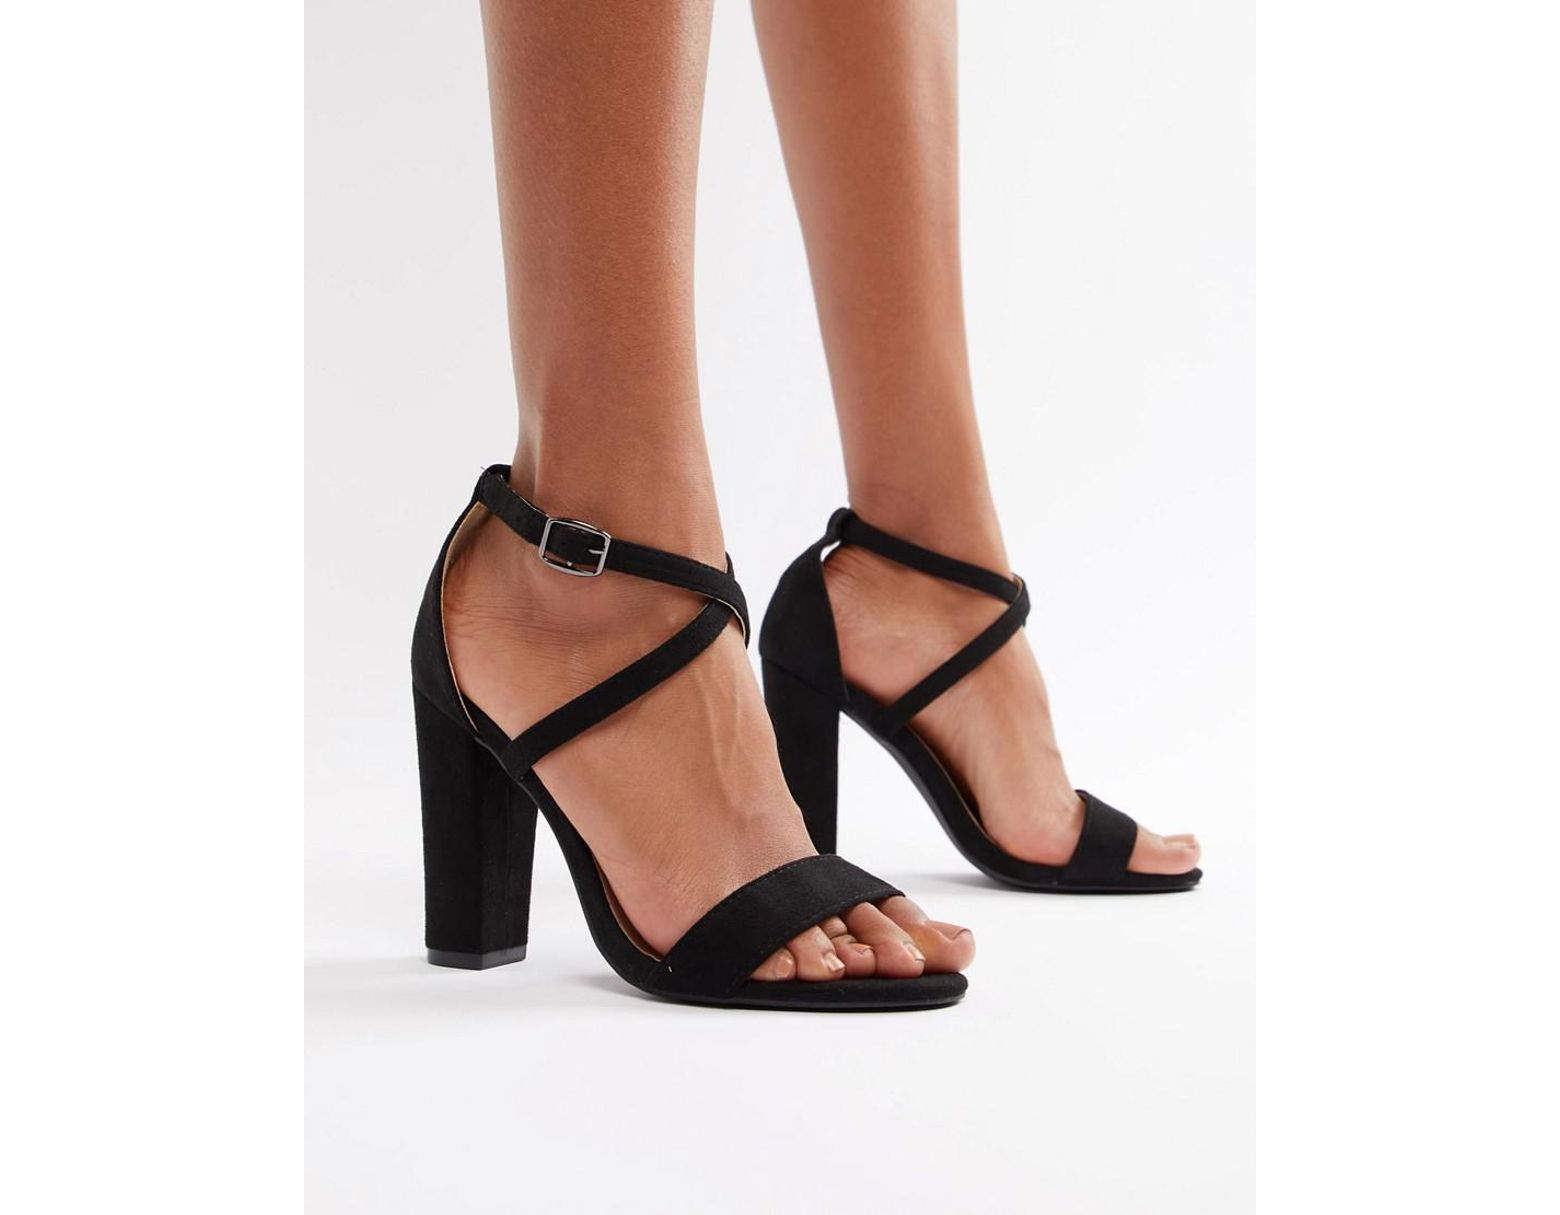 efdde95ff Glamorous Cross Strap Block Heeled Sandals In Black in Black - Lyst